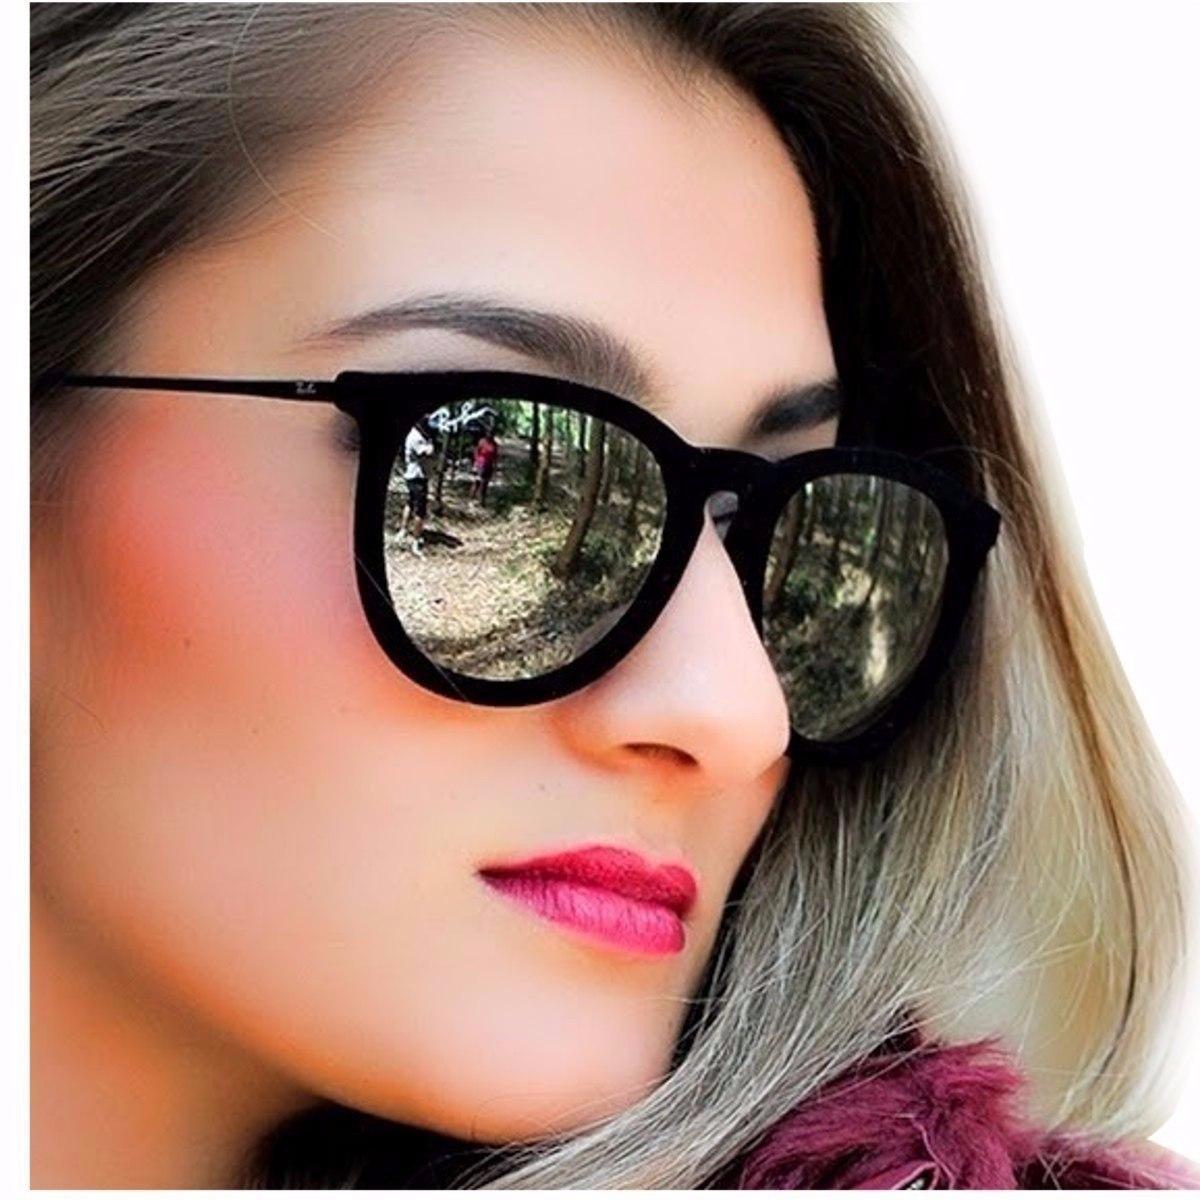 ray ban oculos de sol feminino erika velvet veludo espelhado. Carregando  zoom. 9b573615734d3